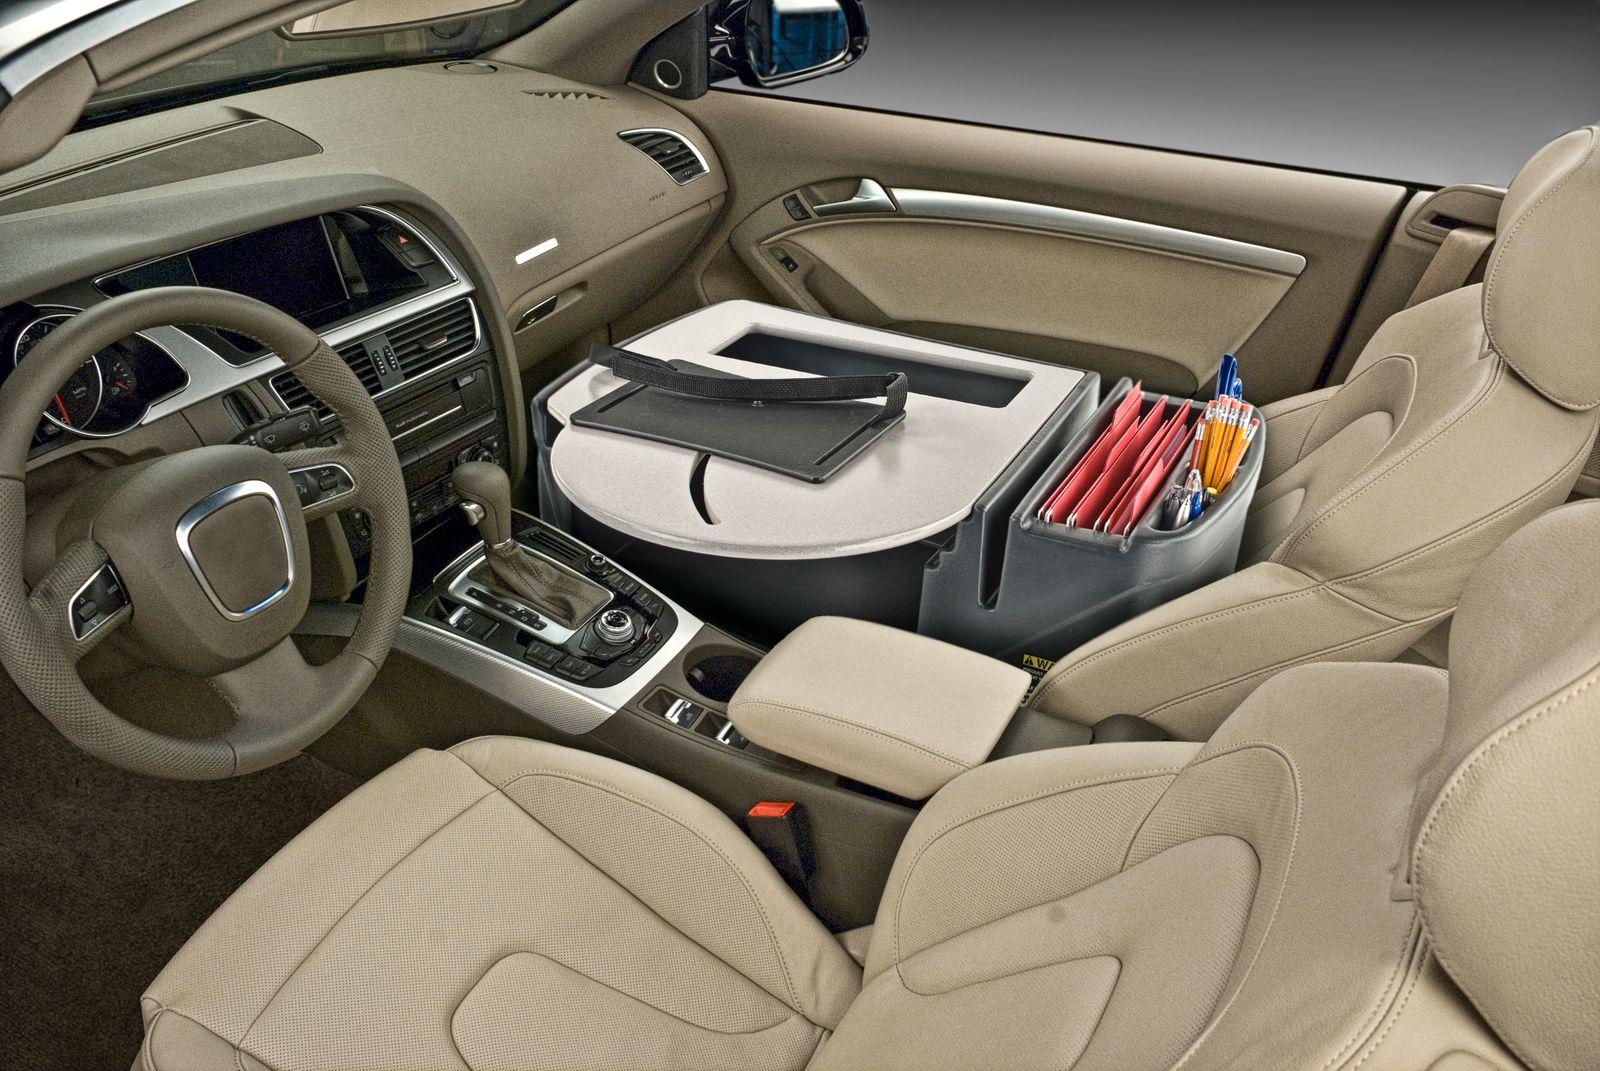 Büro im Auto